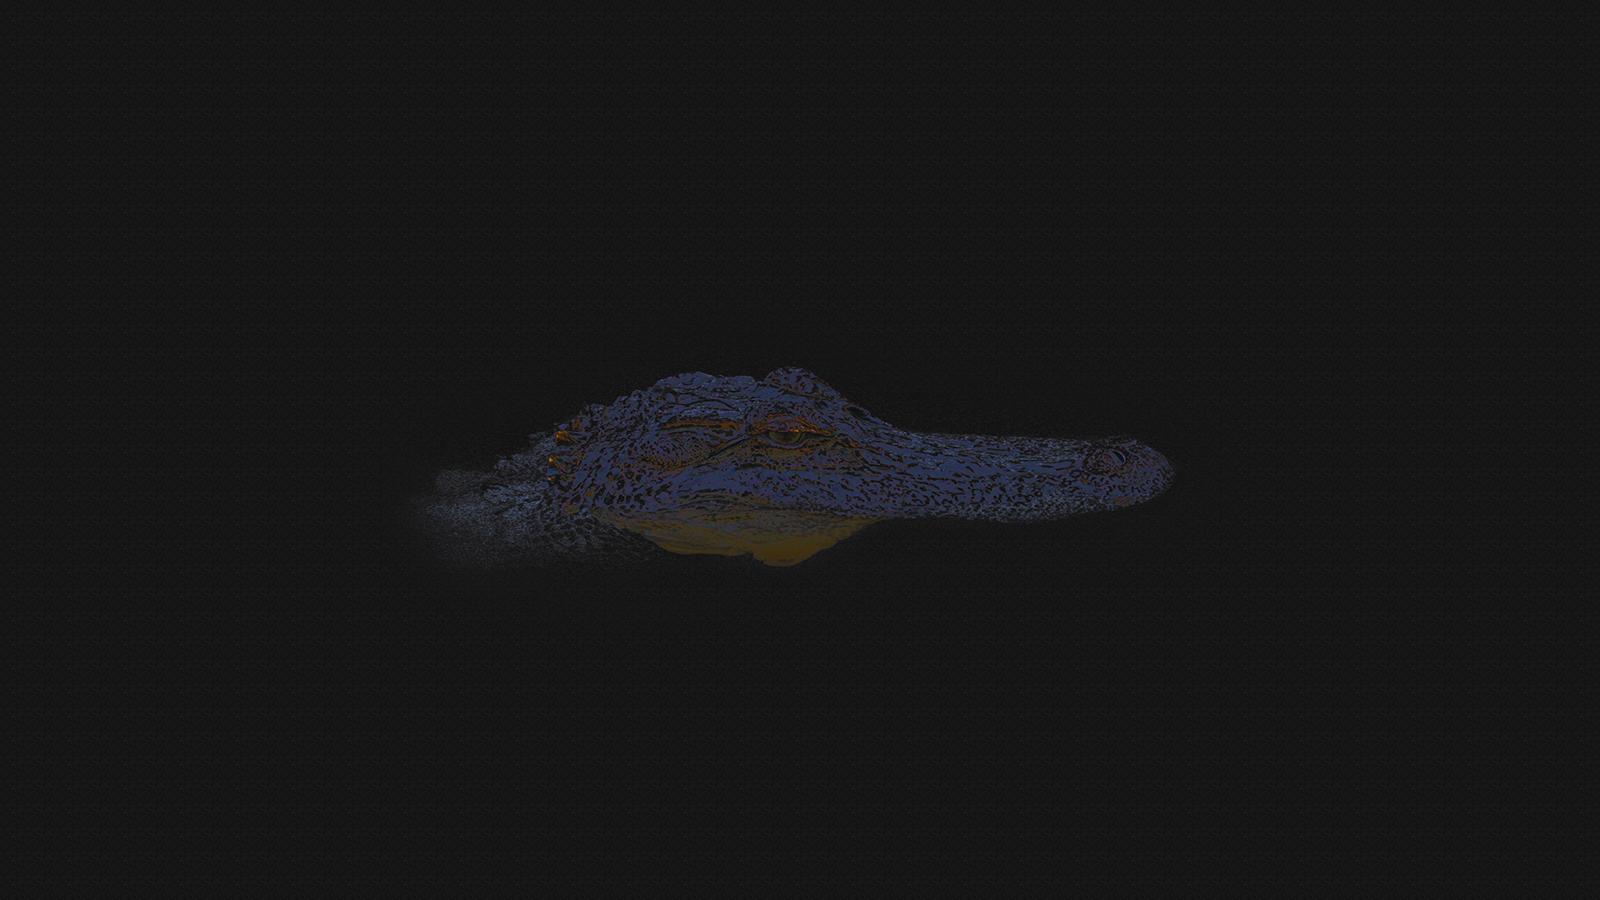 Wallpaper Black Background Reflection Blue Crocodiles